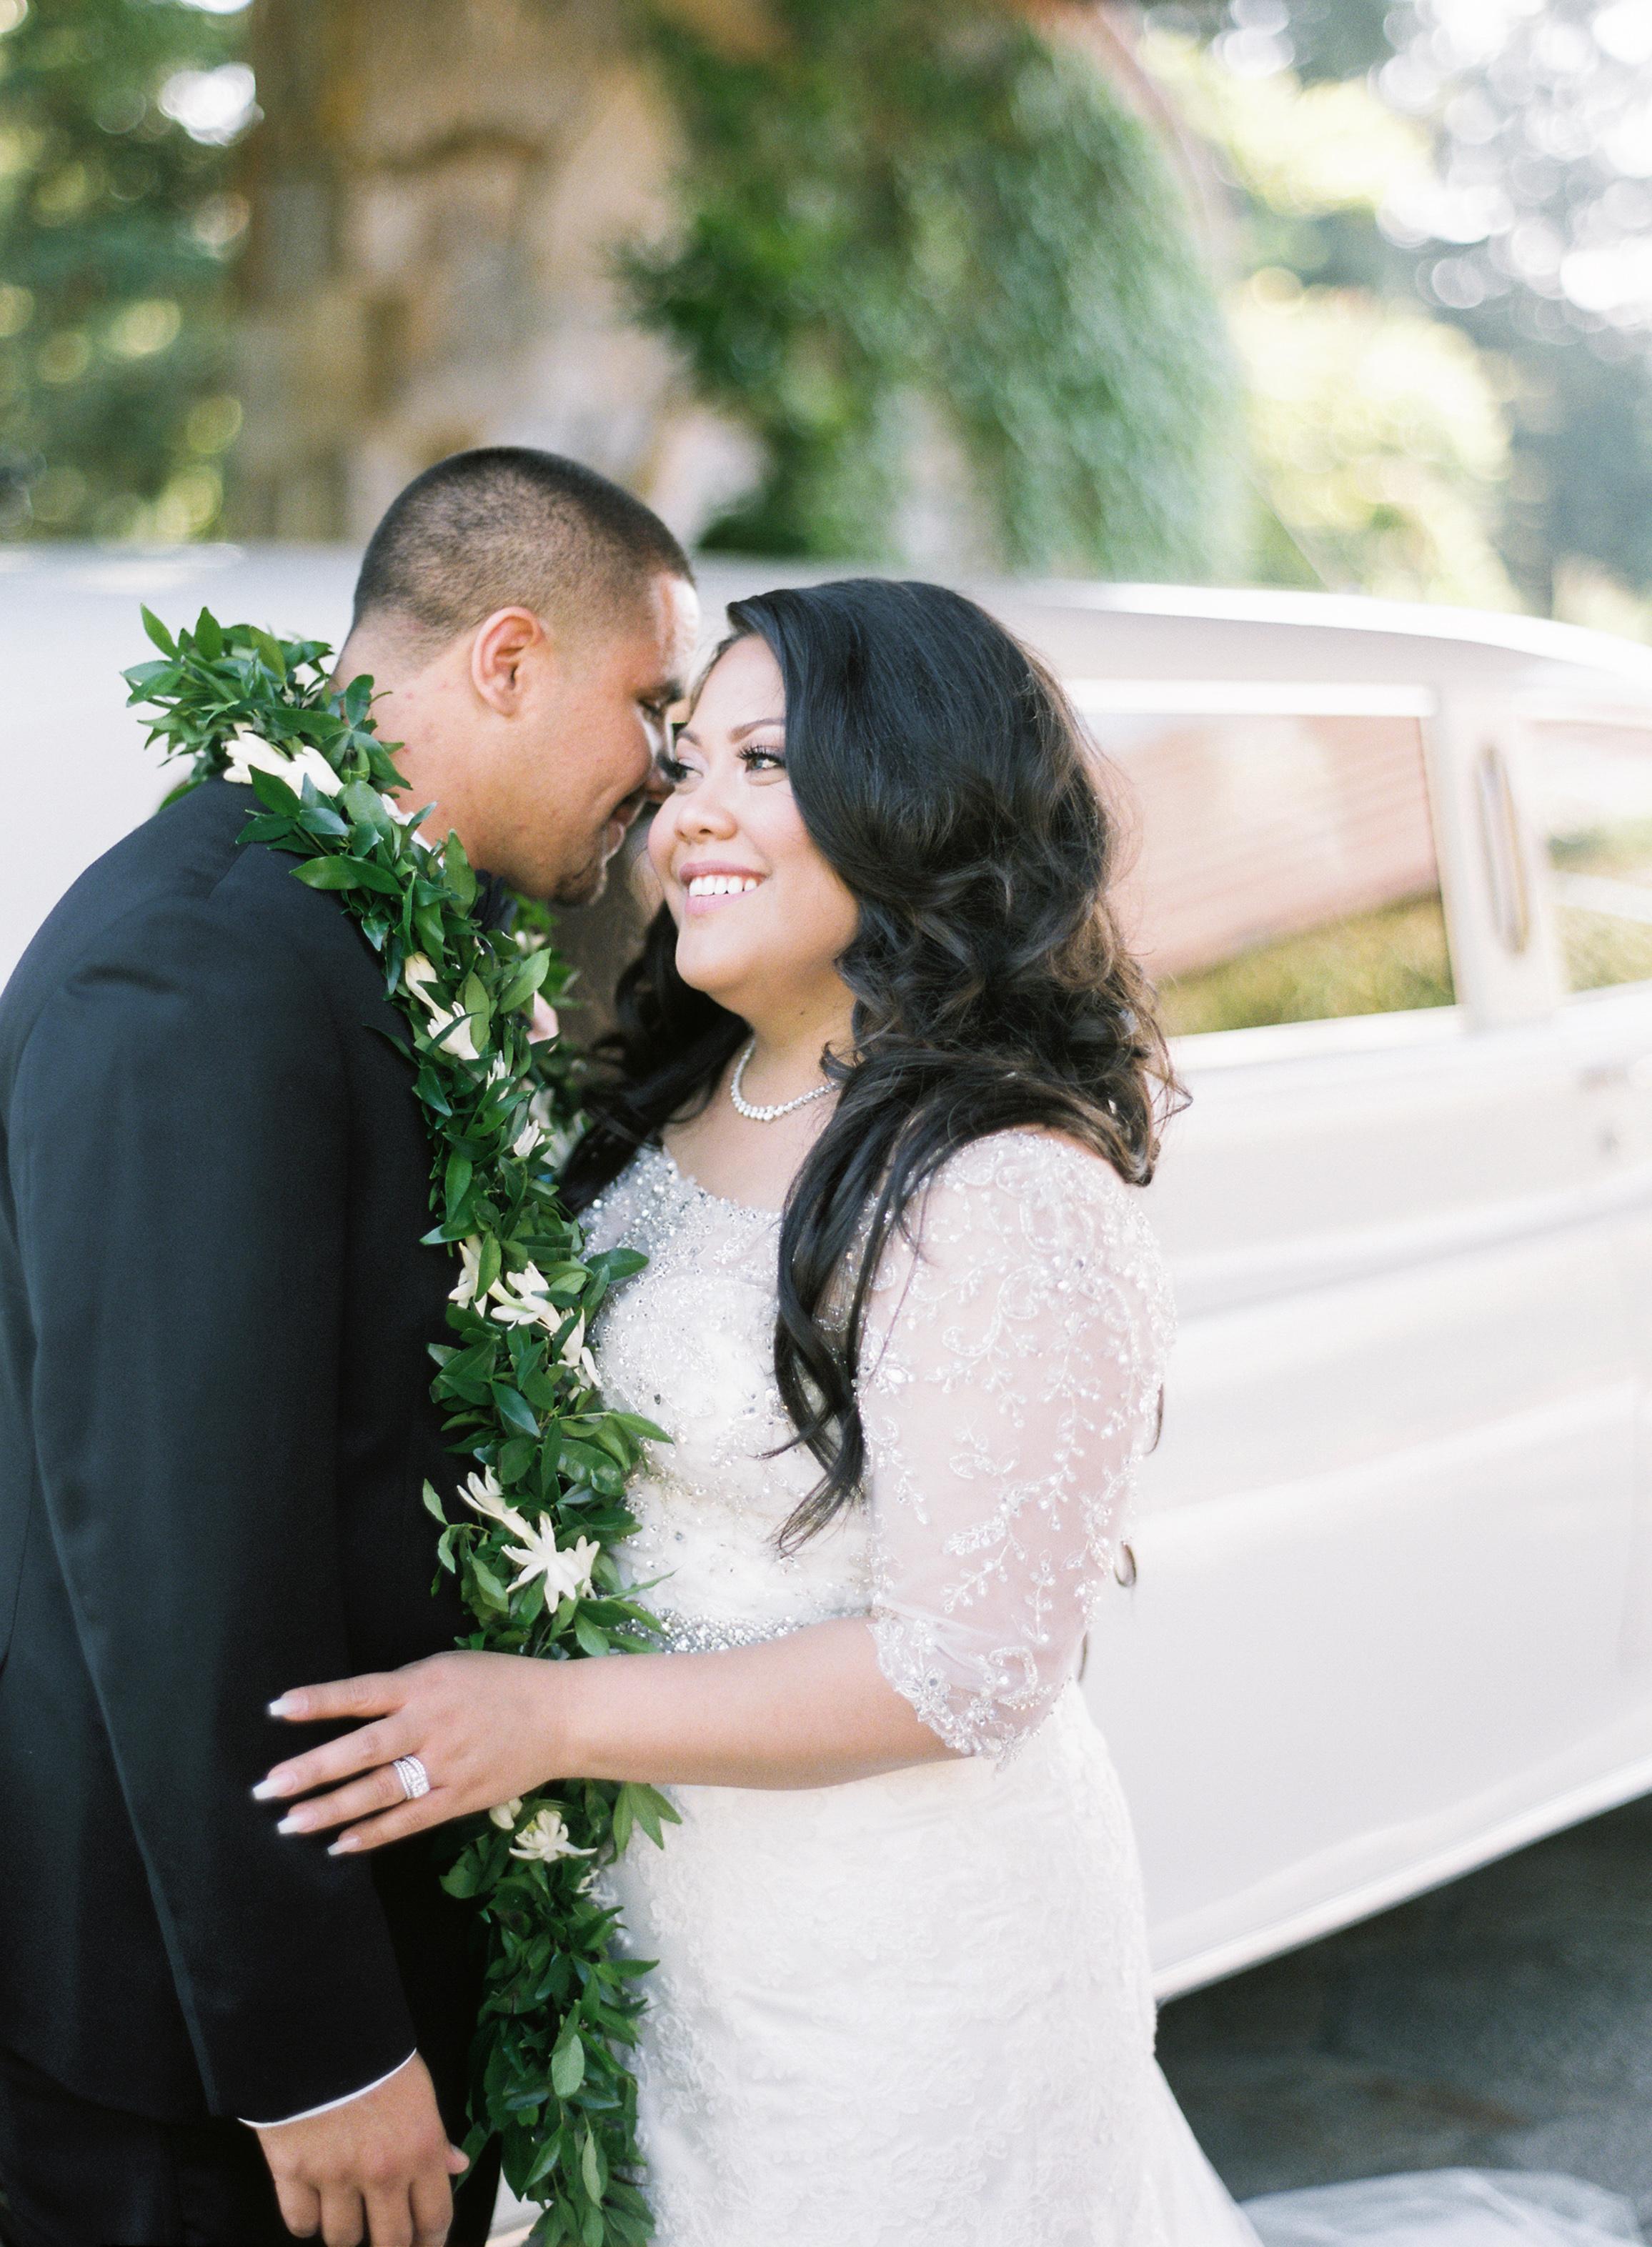 hawaiian-inspired-wedding-in-danville-california-004-2.jpg